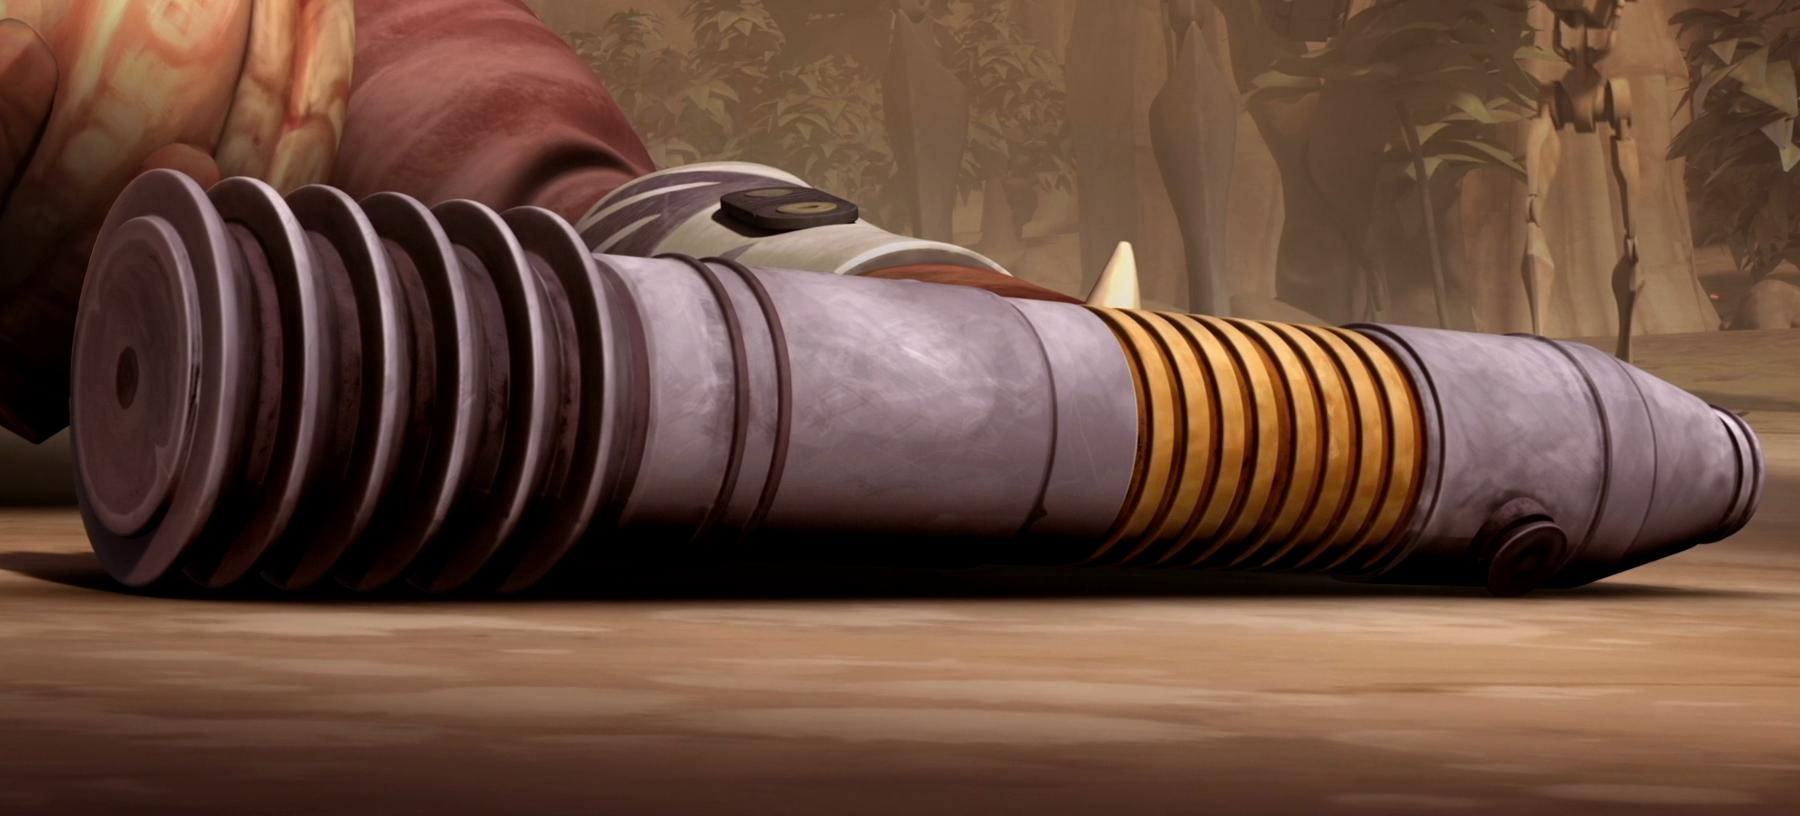 Ima-Gun Di's lightsaber